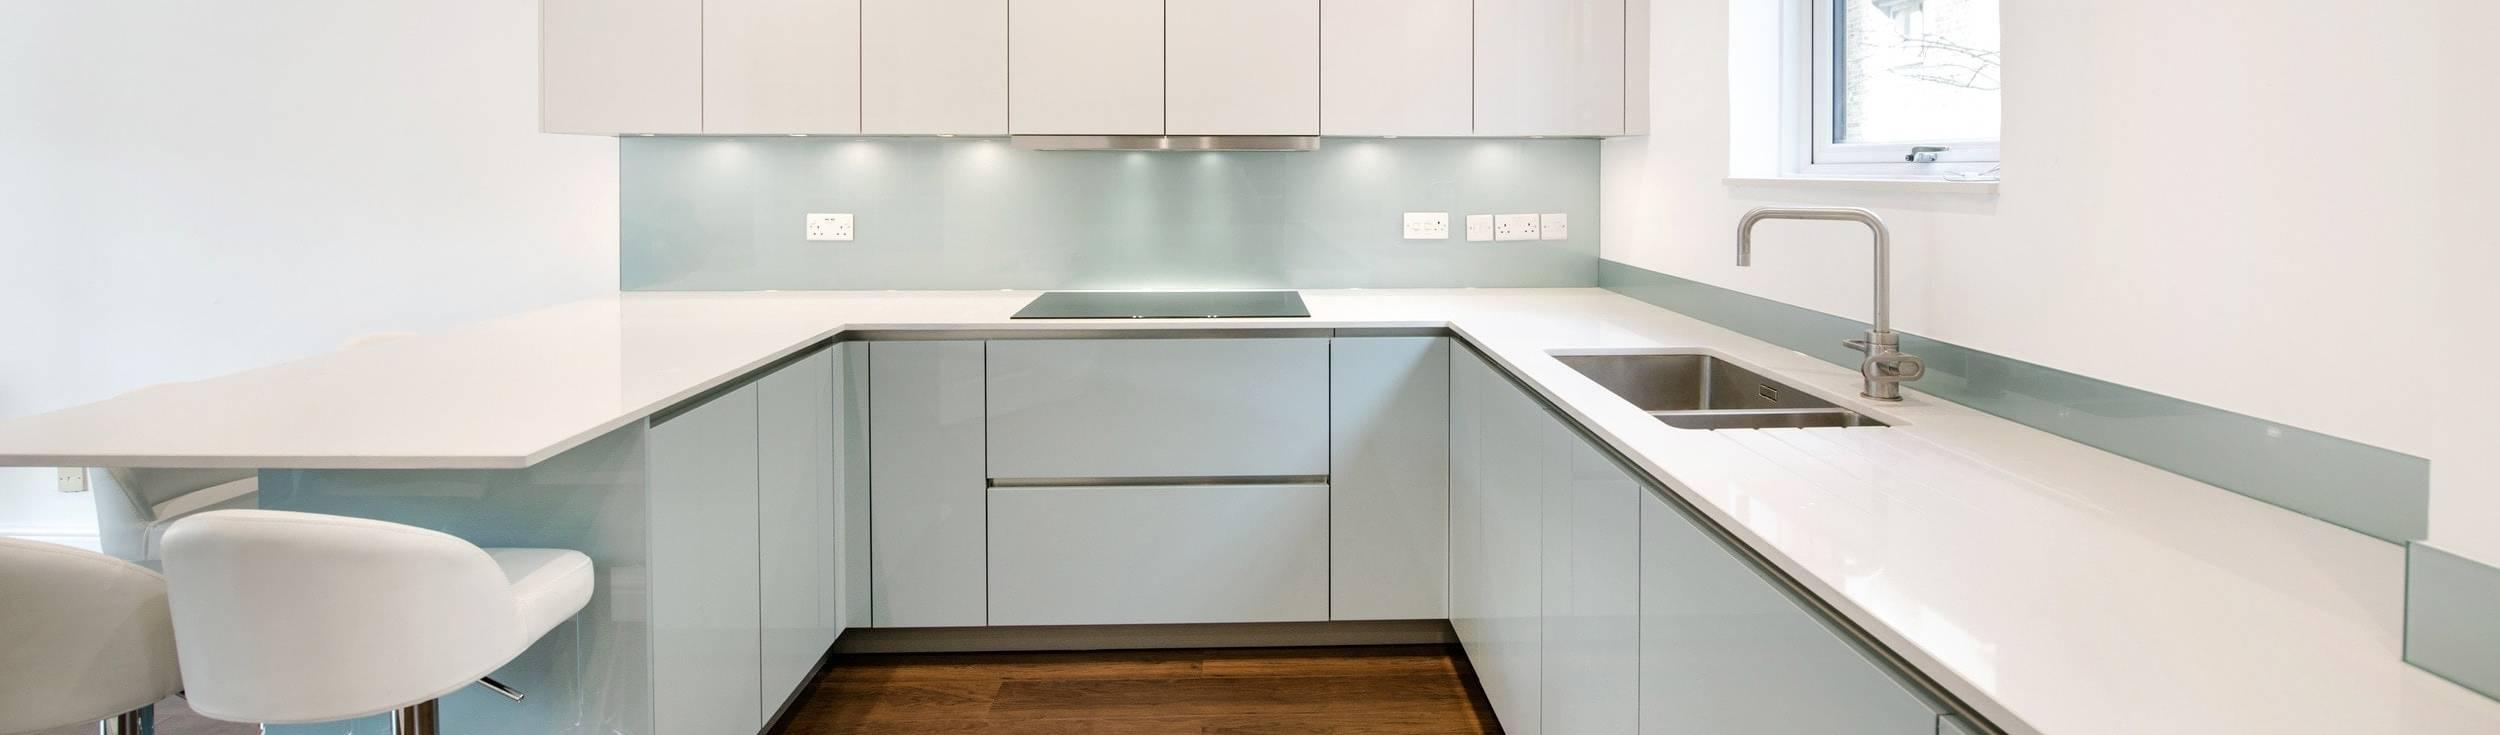 LWK Kitchens SA